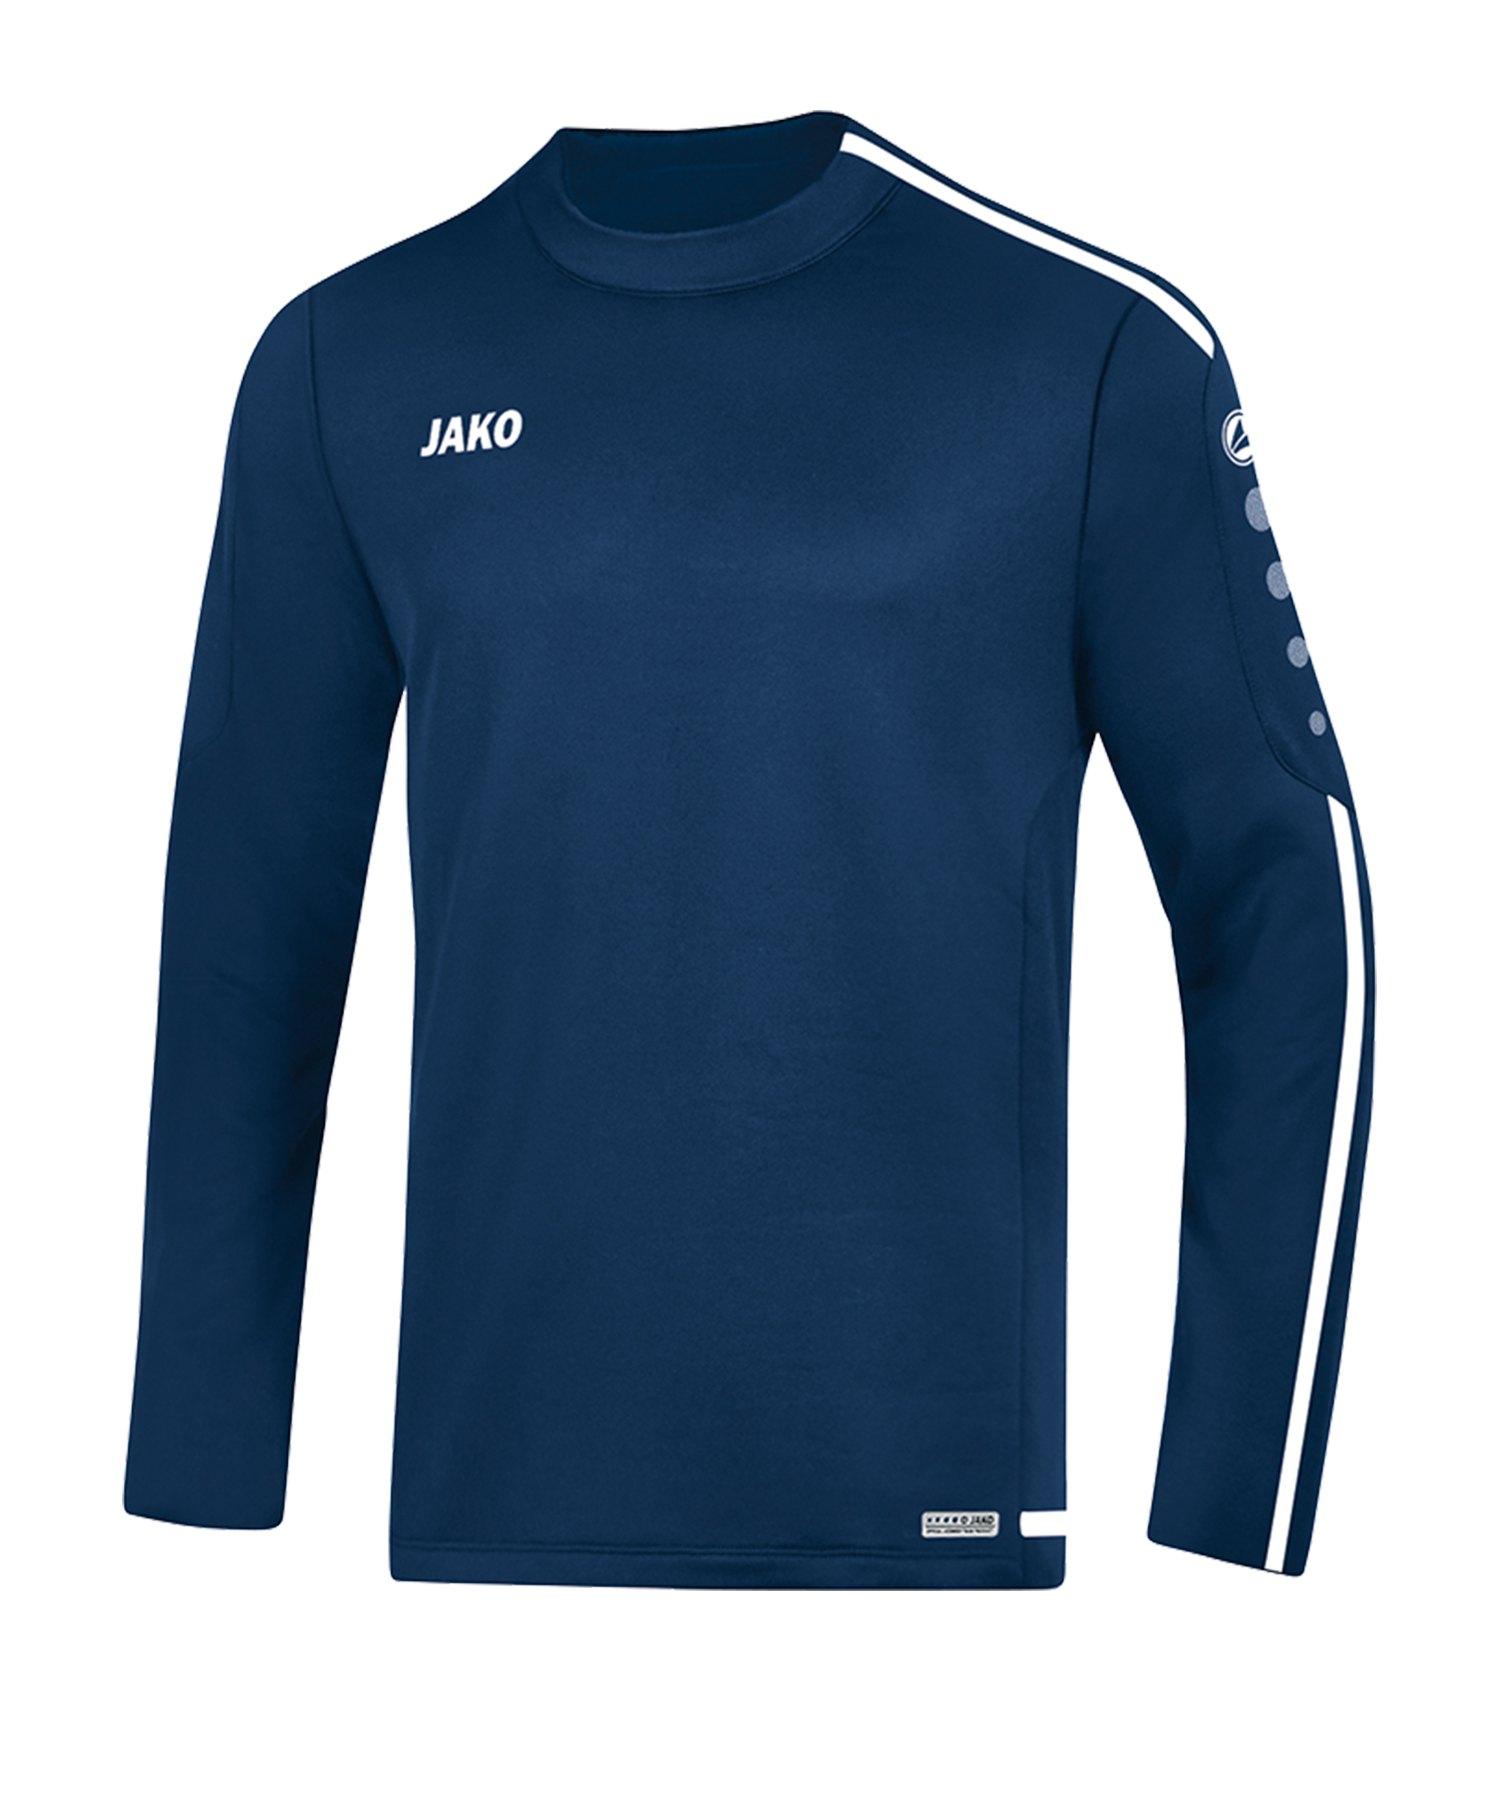 Jako Striker 2.0 Sweatshirt Blau Weiss F99 - Blau